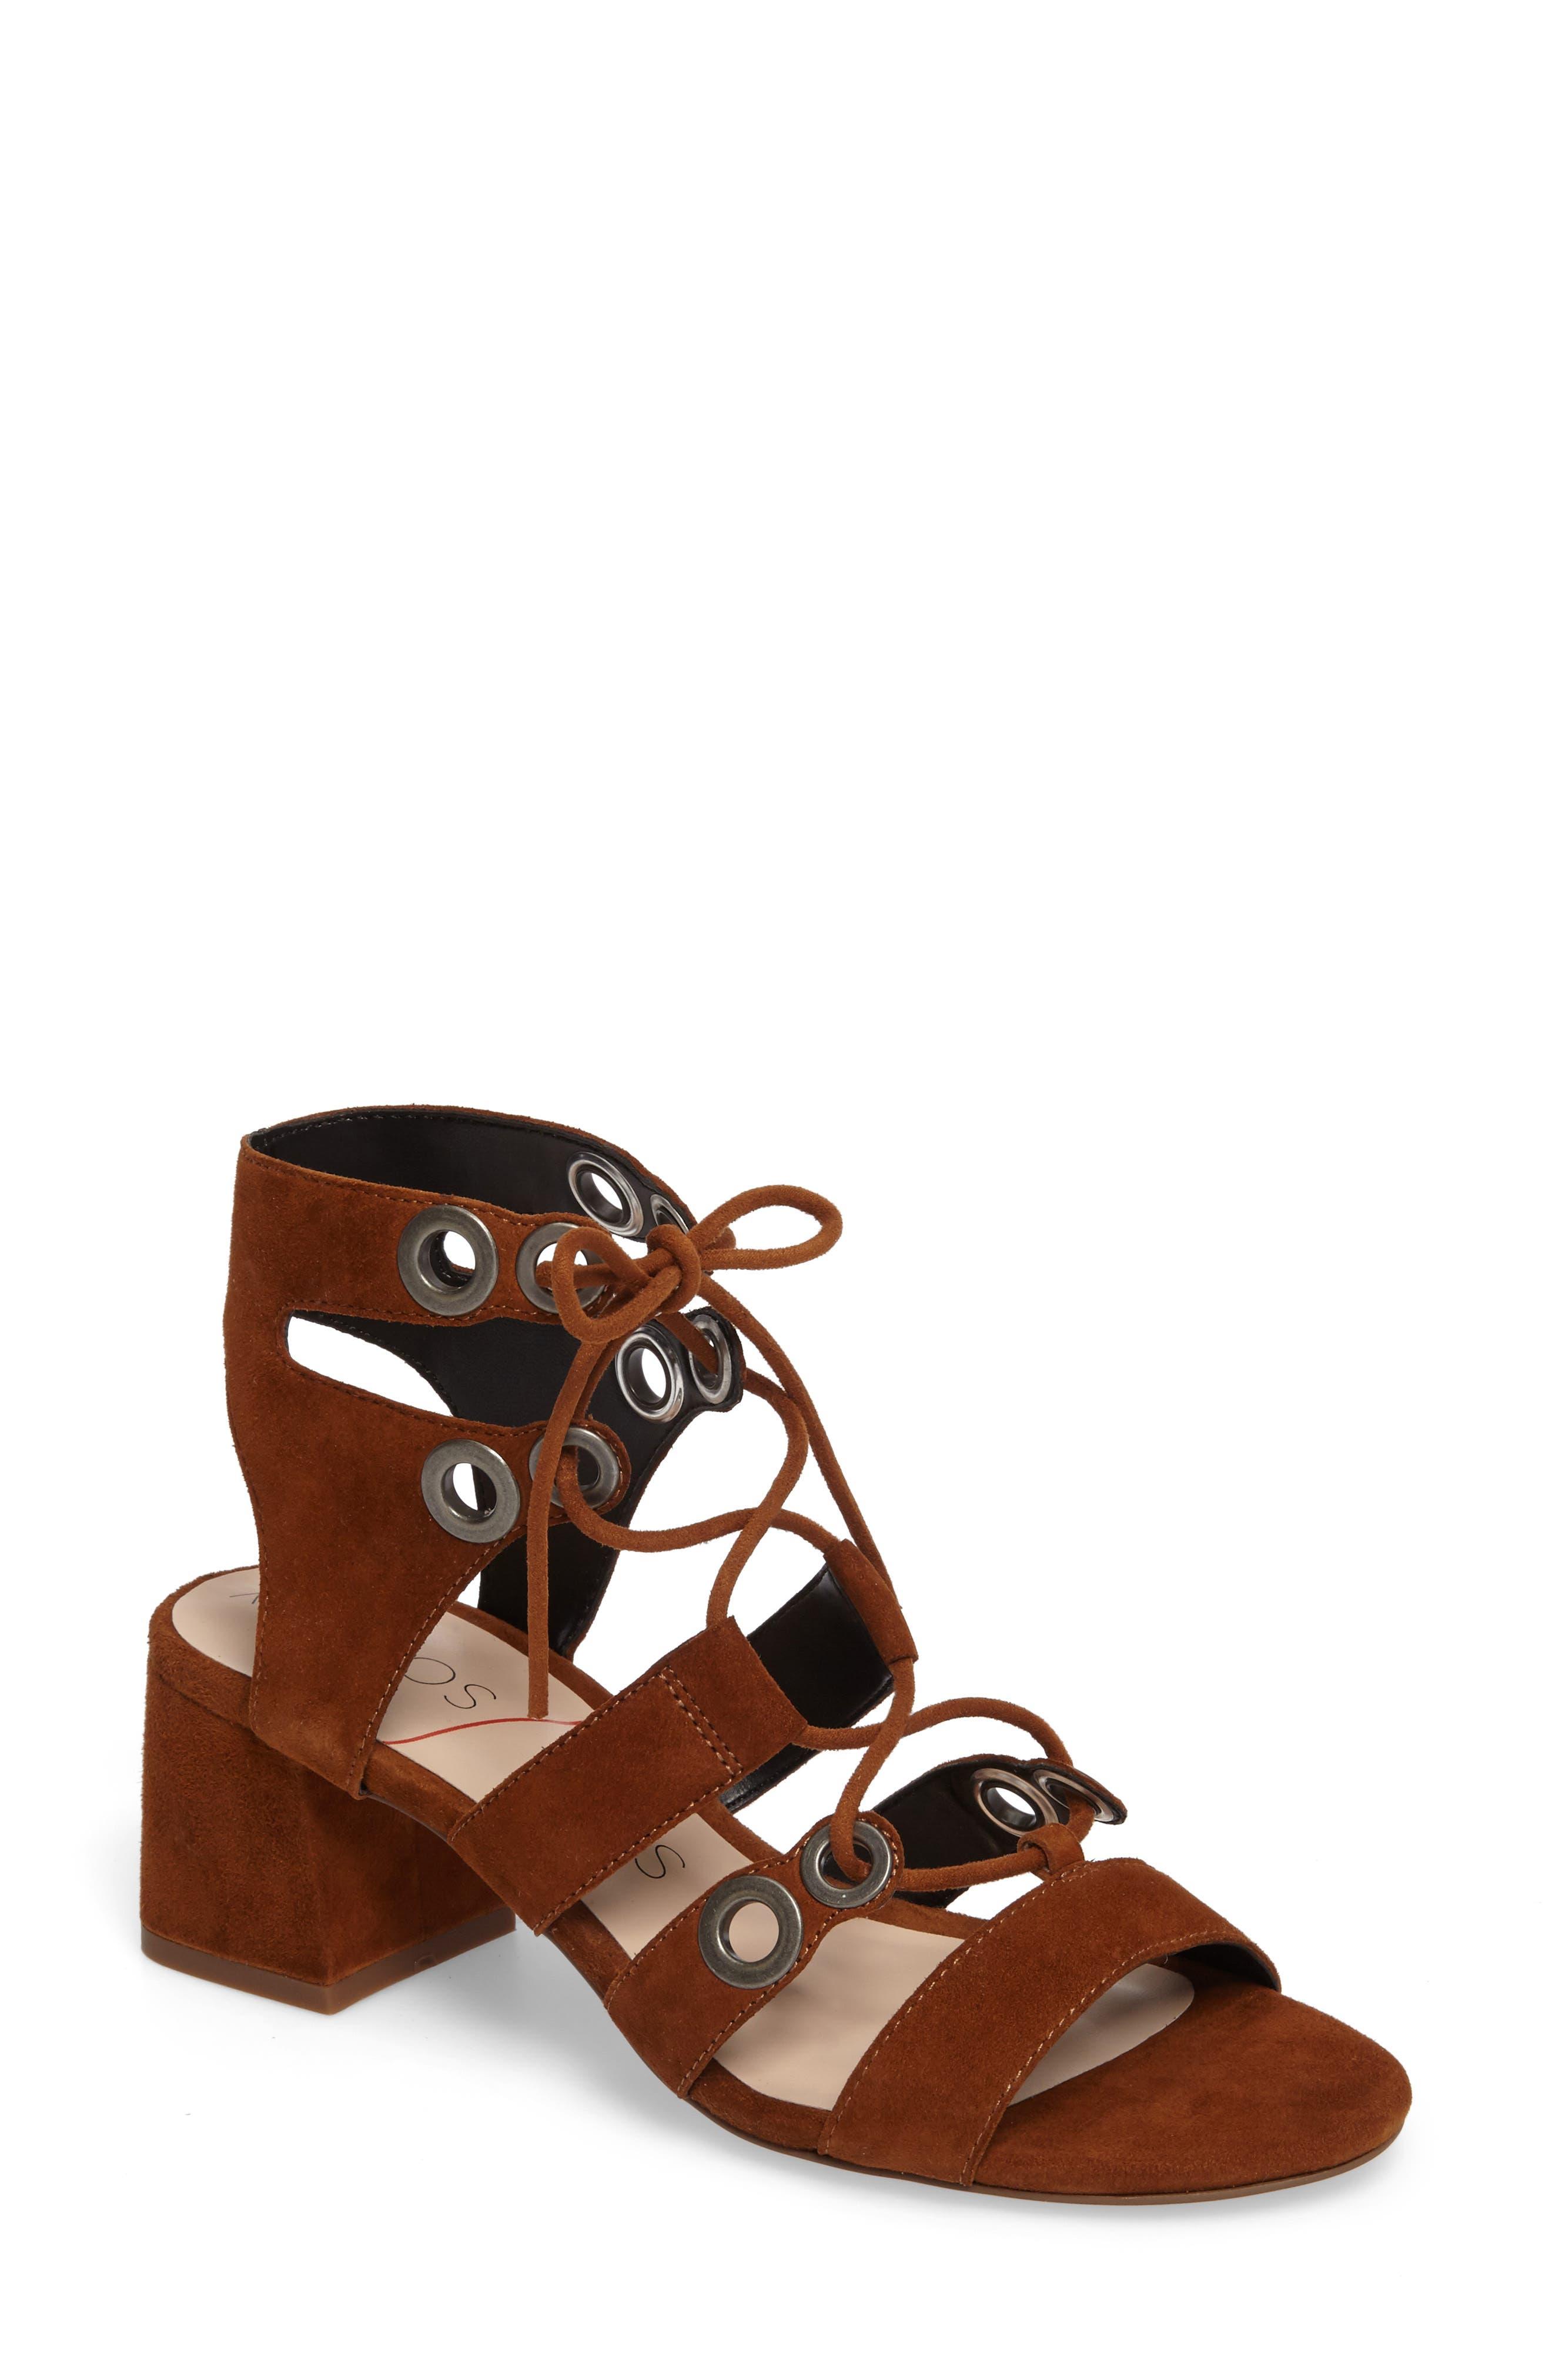 Main Image - Sole Society Rosemary Lace-Up Sandal (Women)